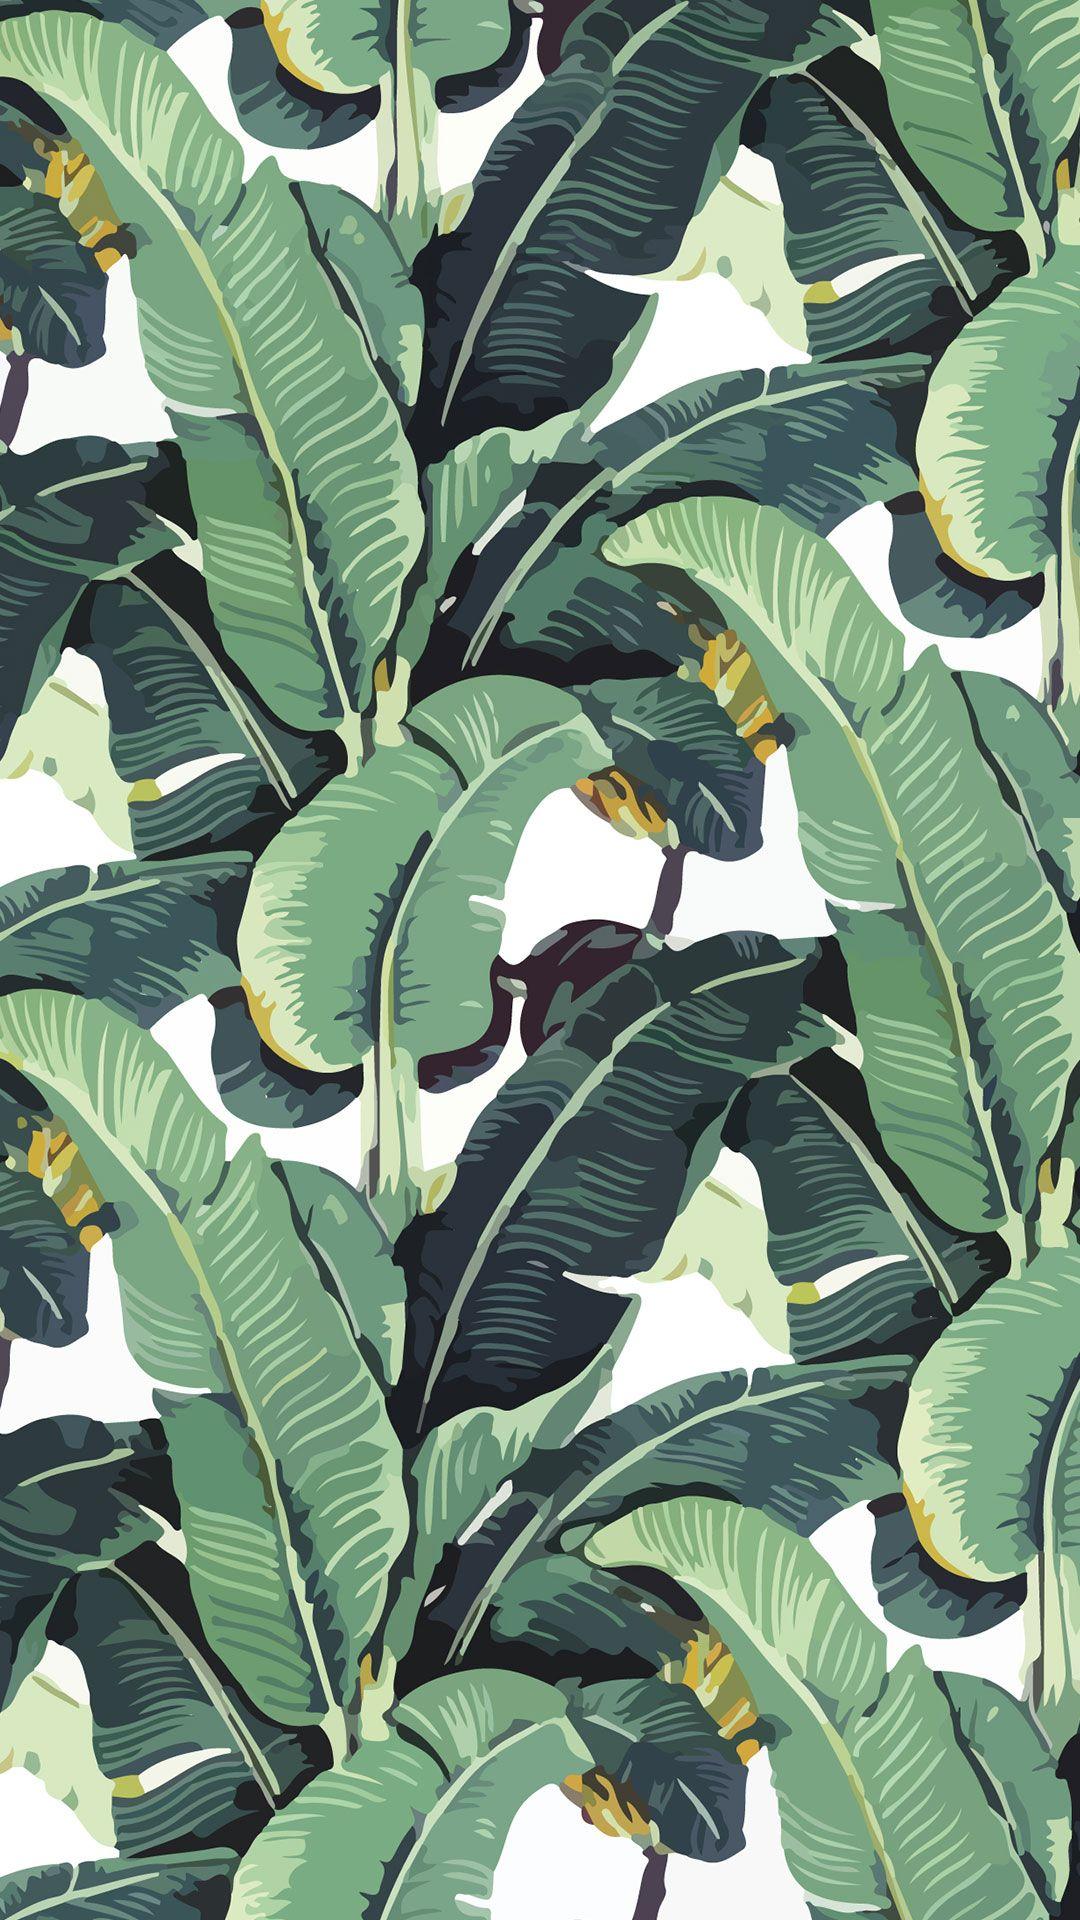 Tropical Wallpaper Leaf Wallpaper Bedroom Wallpaper Leaf Banana Leaf Wallpaper